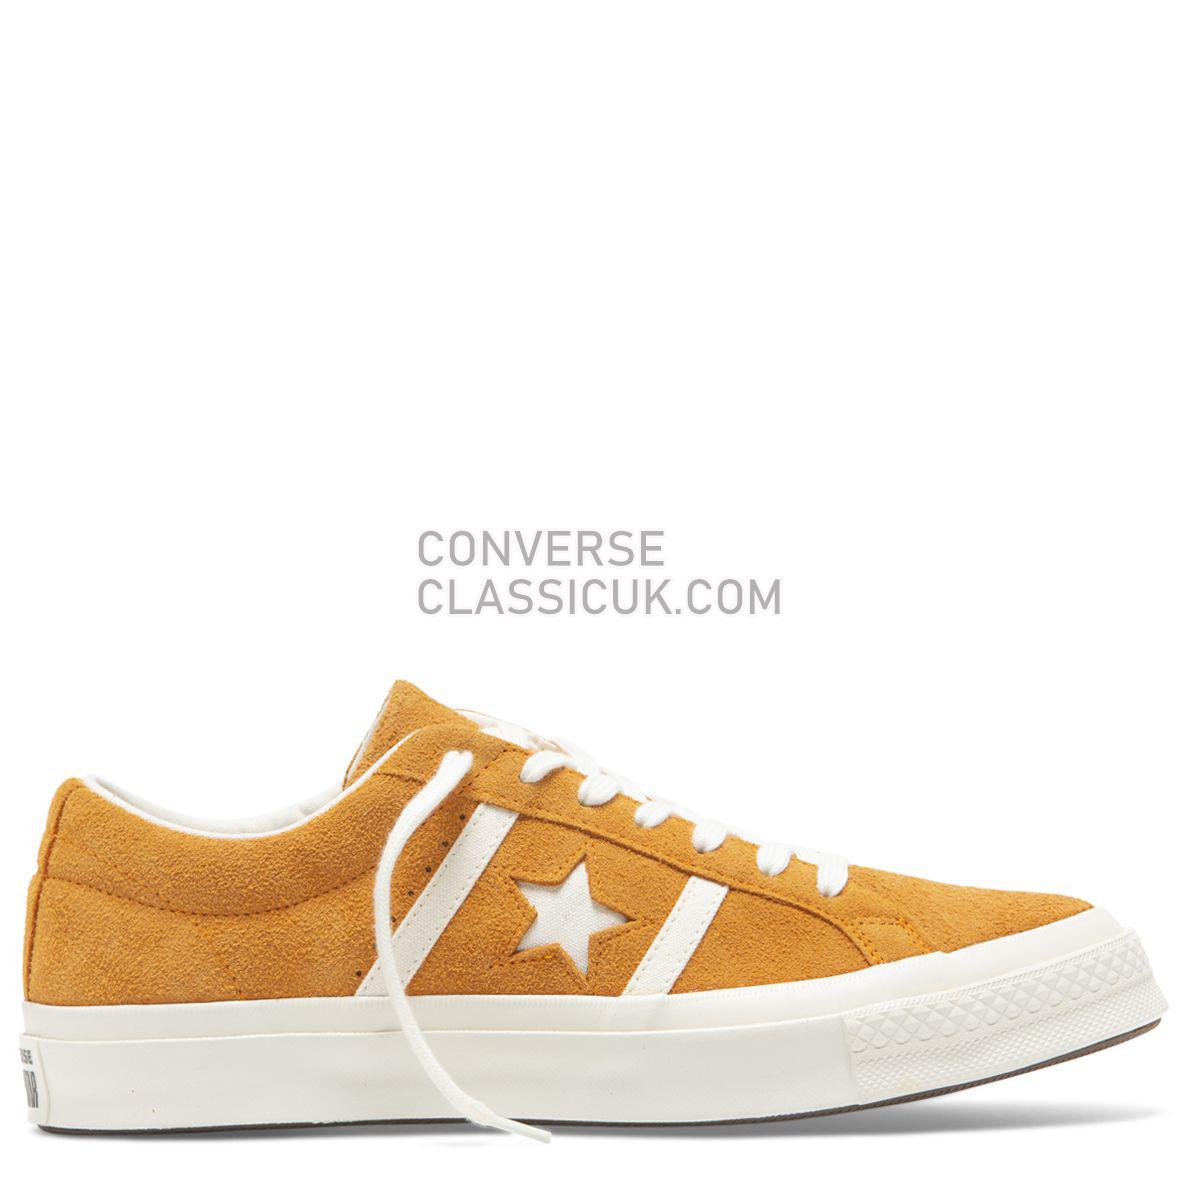 Converse One Star Academy Time Capsule Low Top Orange Rind Mens Womens Unisex 165023 Orange Rind/Egret/Egret Shoes